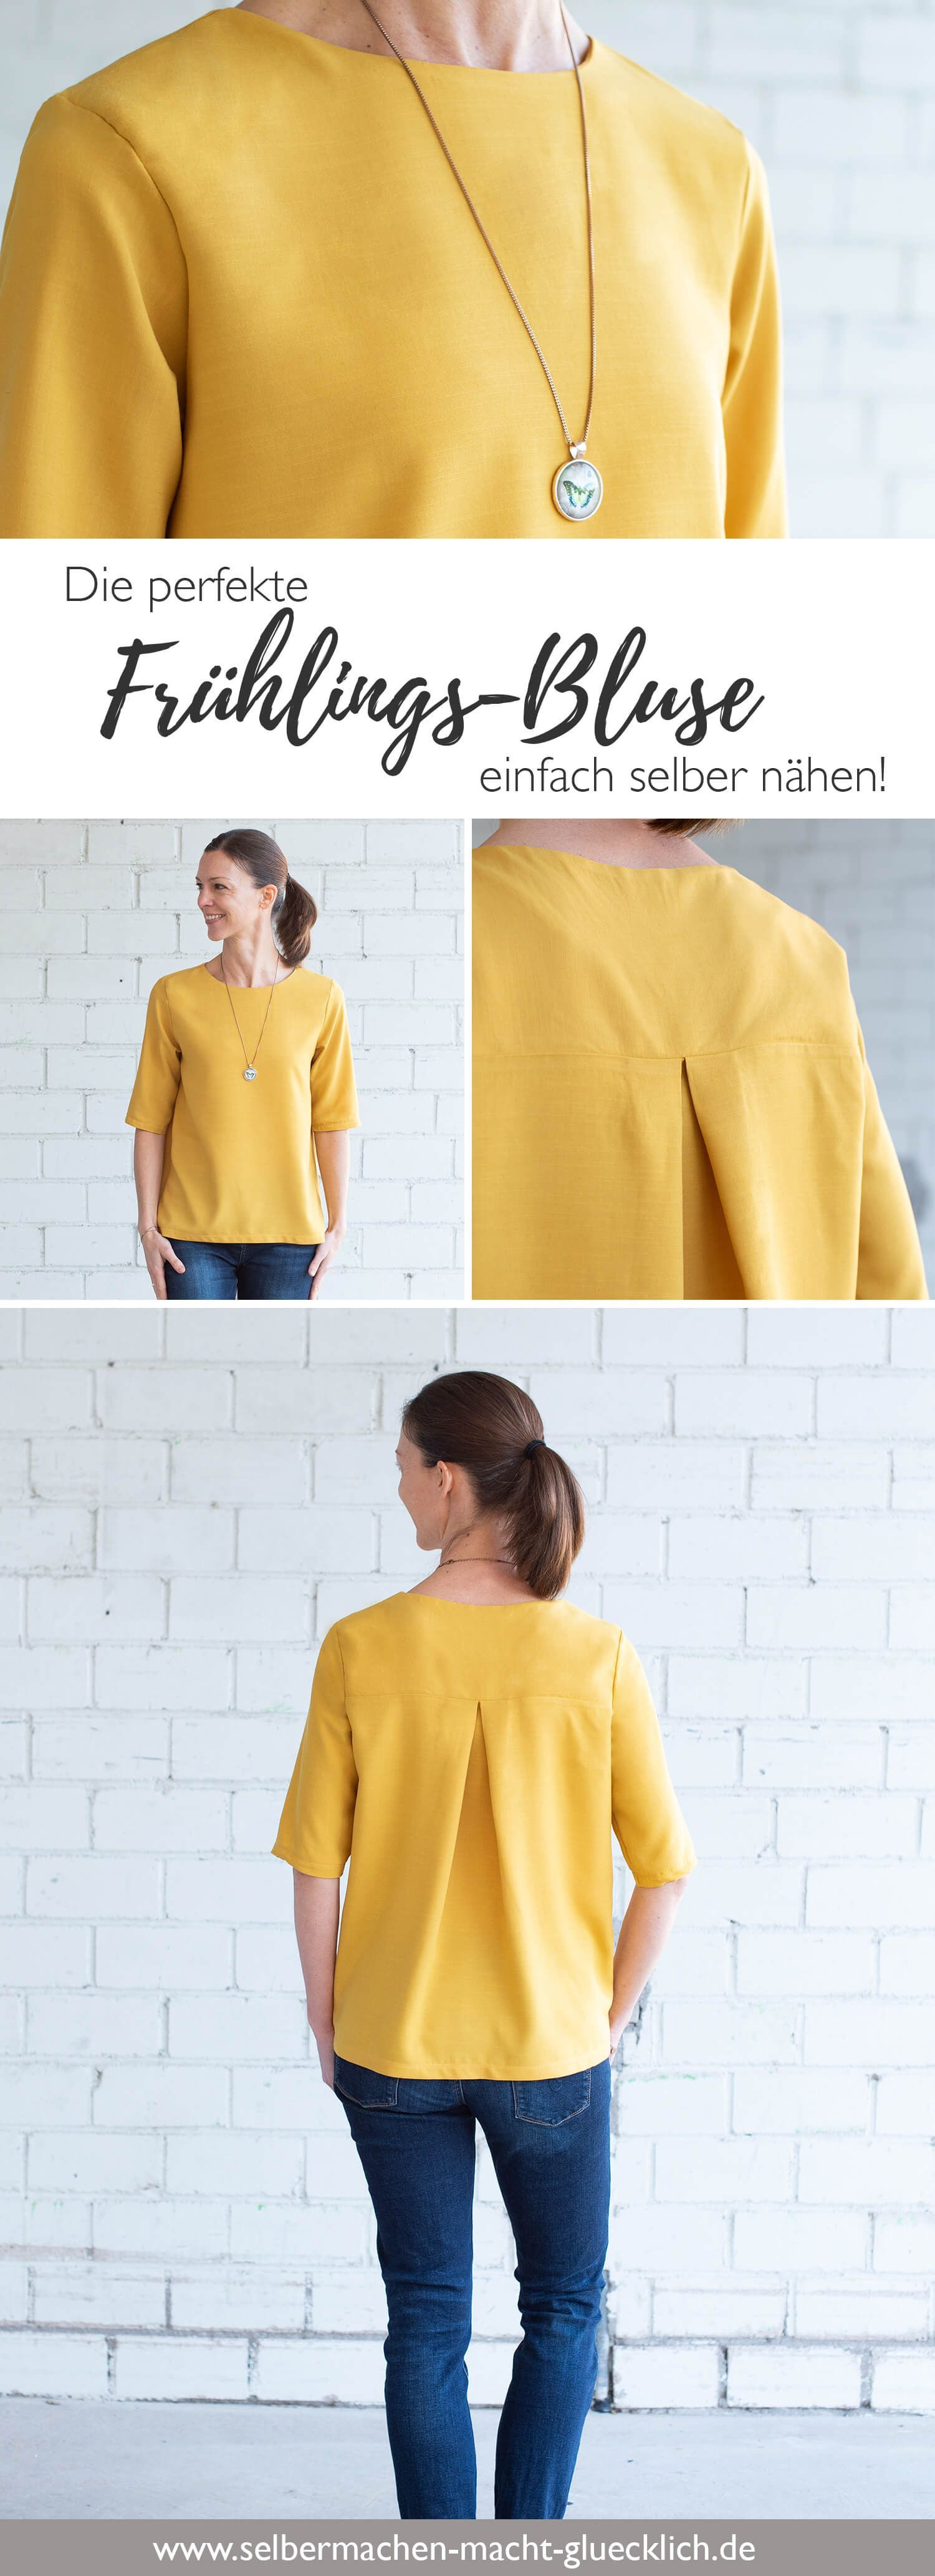 Damen Blusen Schnittmuster - Die perfekte Frühlings-Bluse selber nähen! #textilepatterns